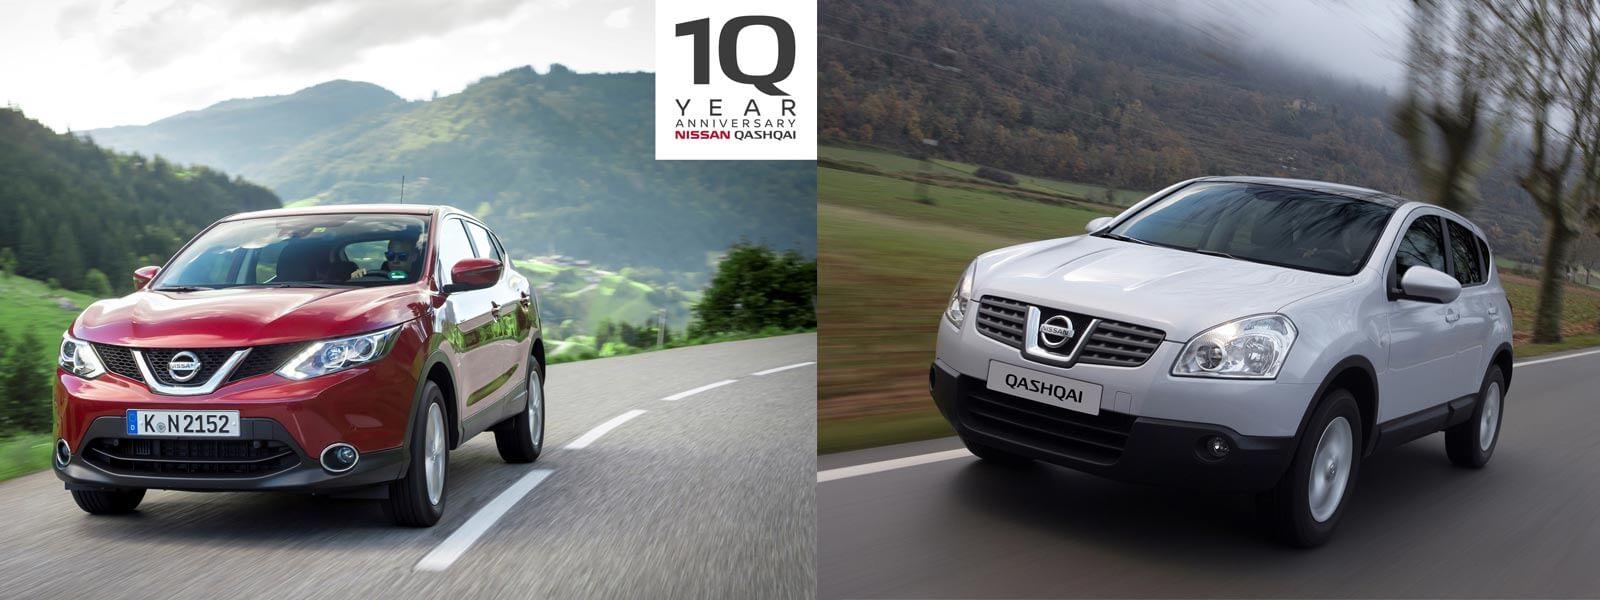 10 Years of Nissan Qashqai